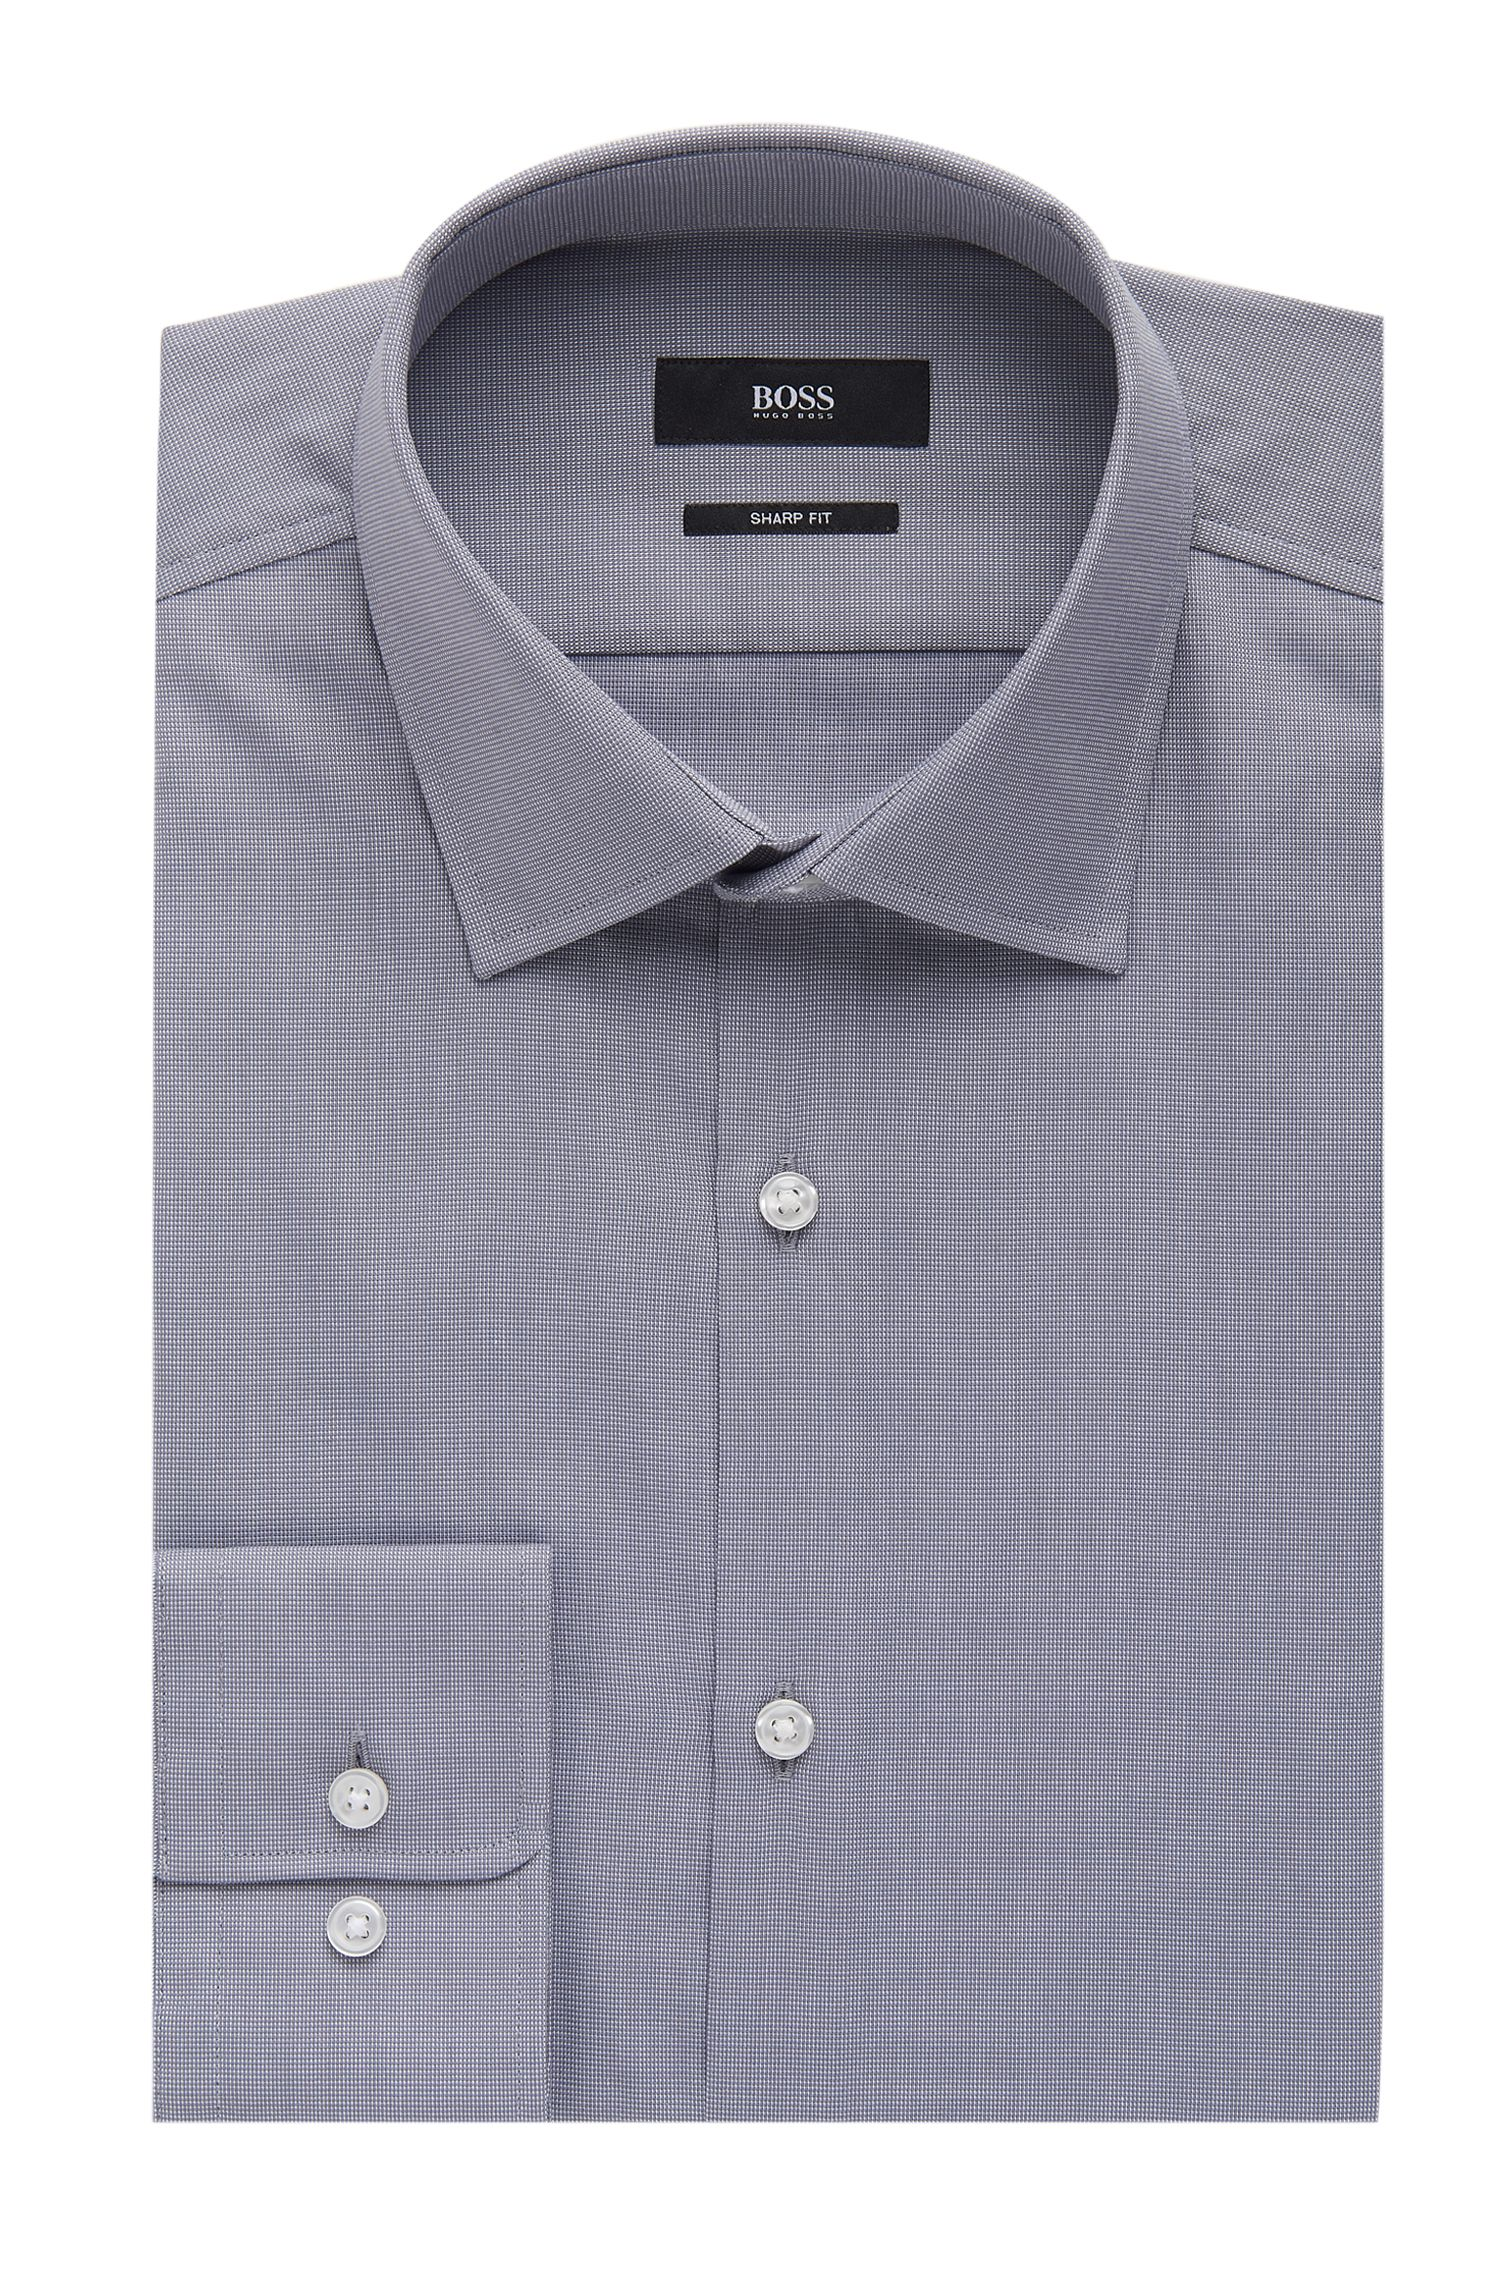 Nailhead Cotton Dress Shirt, Sharp Fit  Marley US